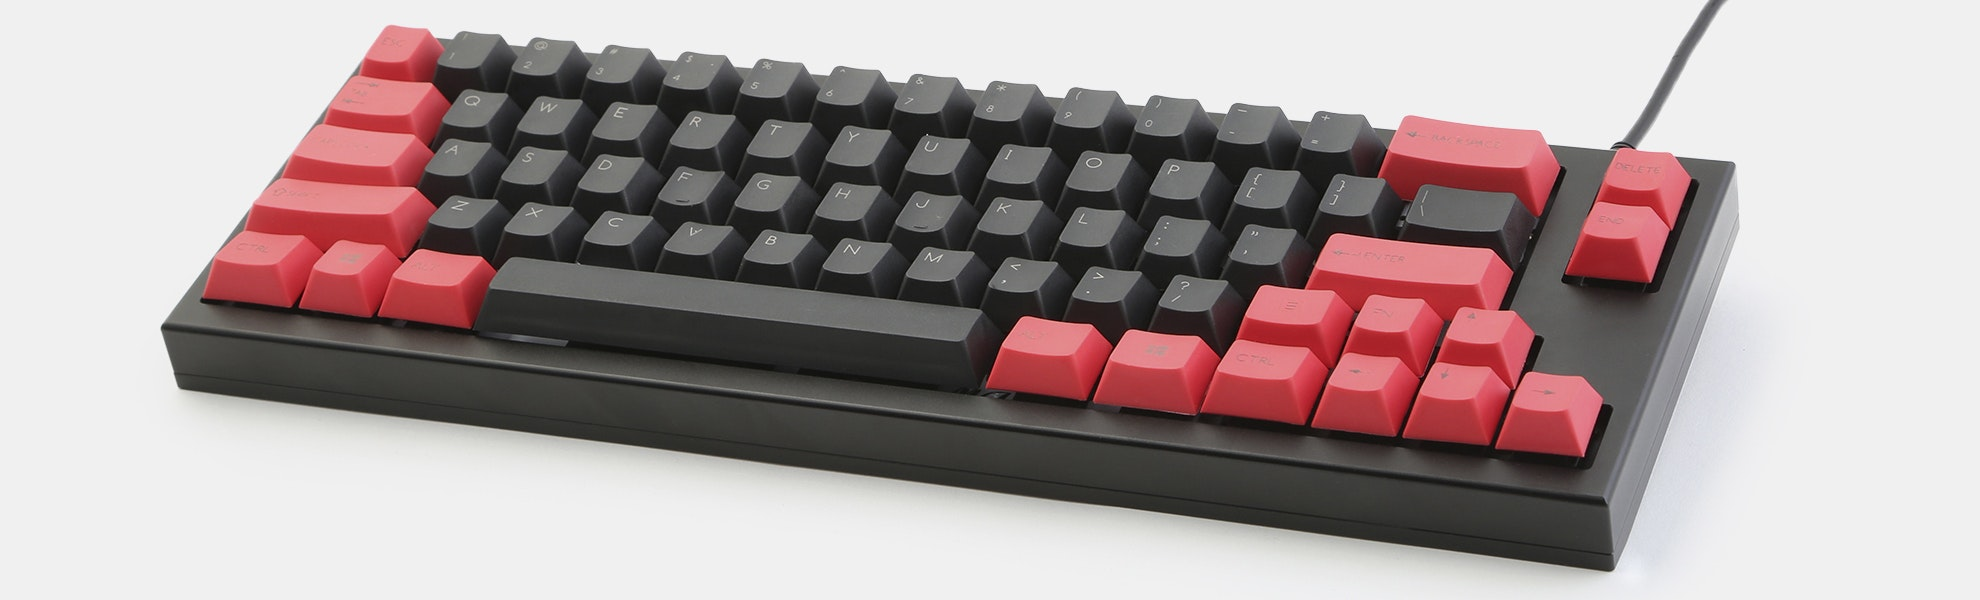 KBD66 Custom Mechanical Keyboard Kit